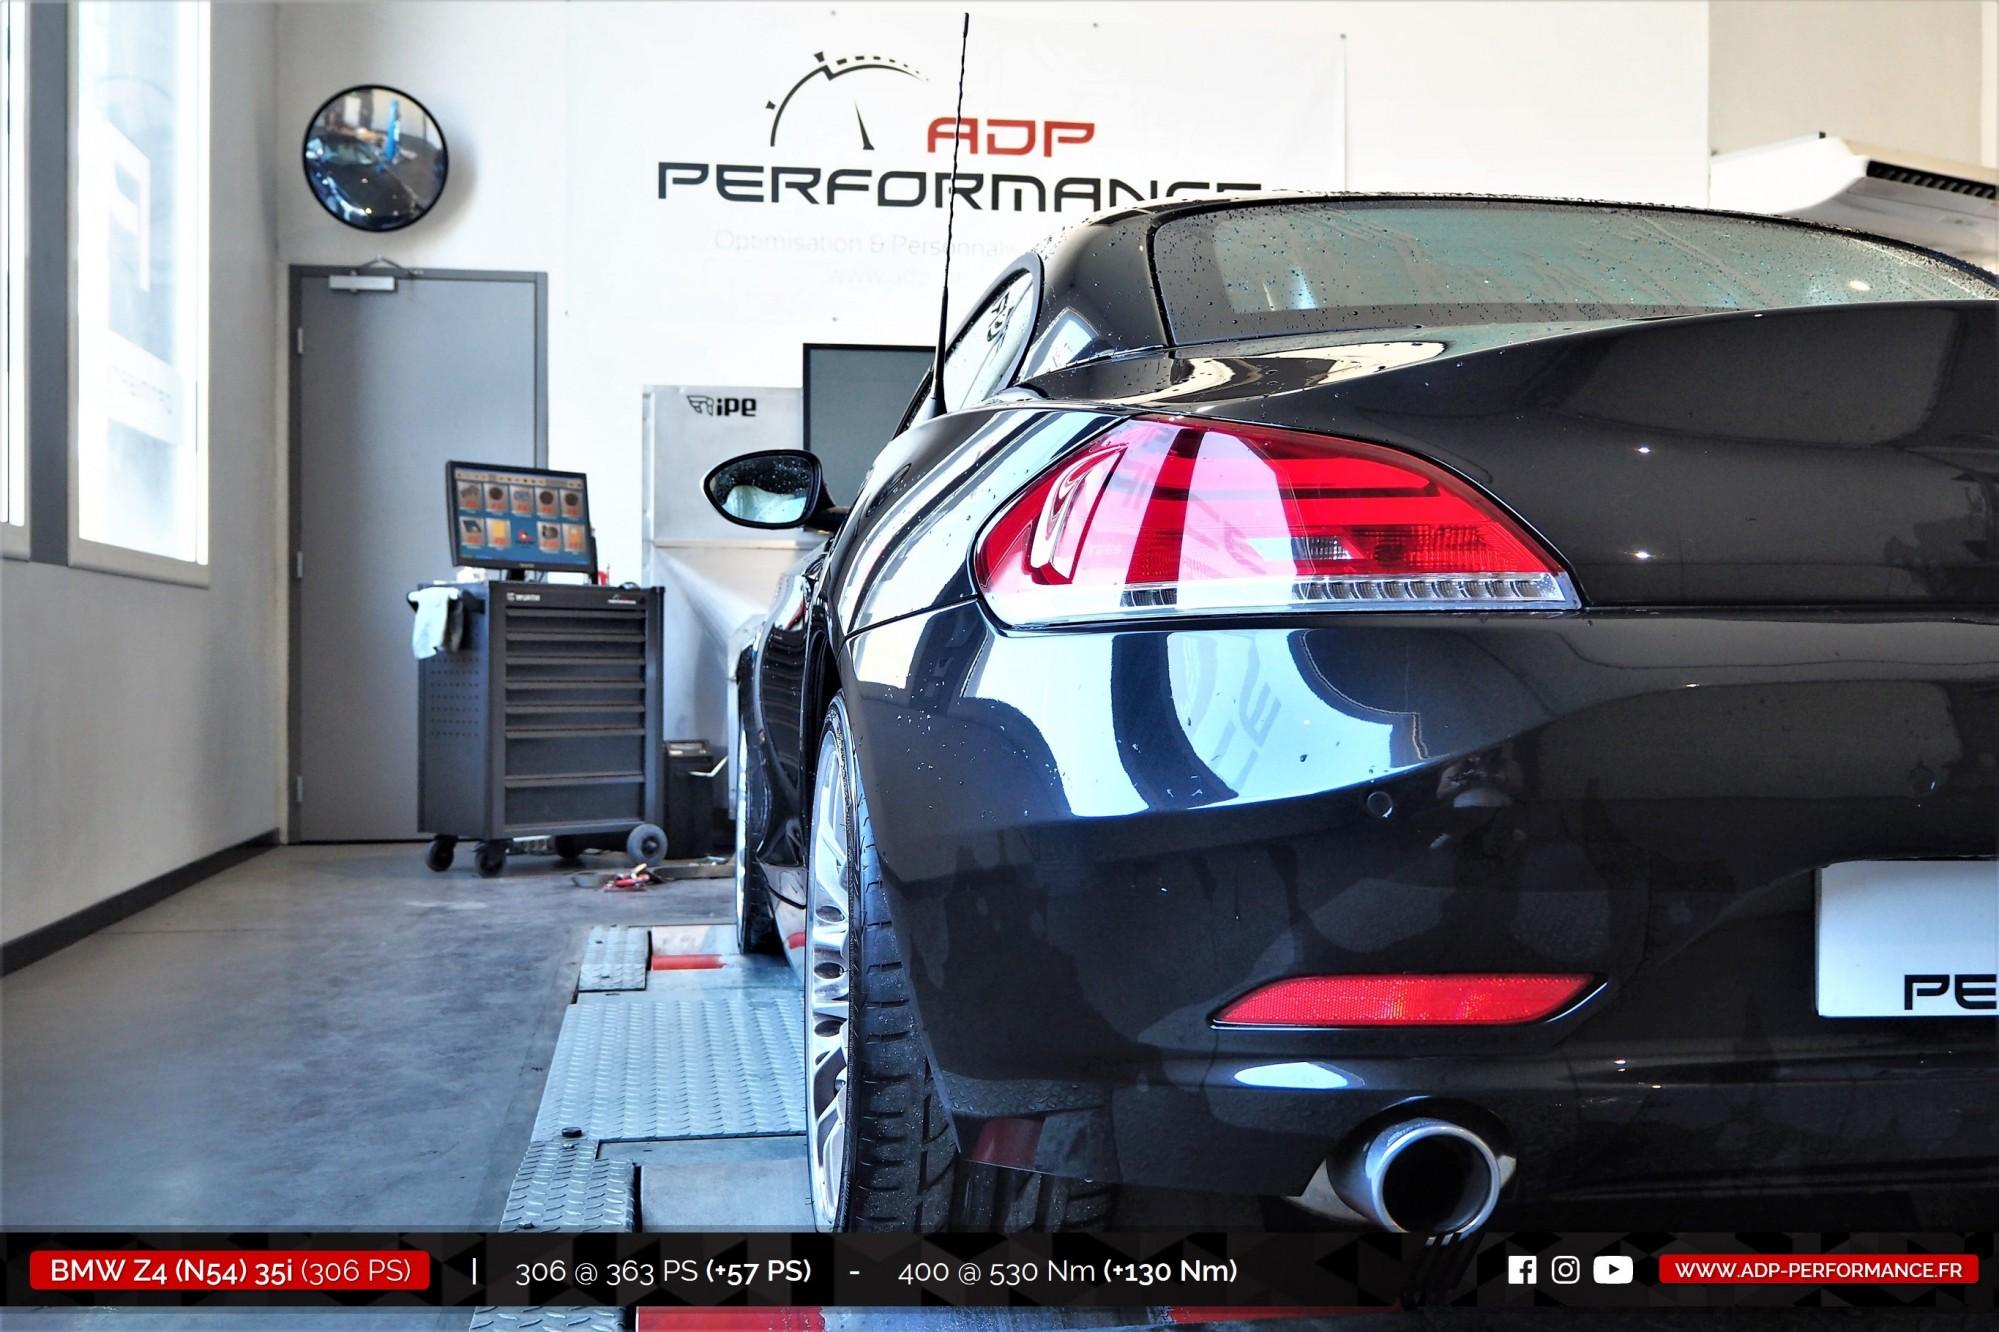 Reprogrammation moteur Marseille - BMW Z4 (N54) 35i 306cv - ADP Performance